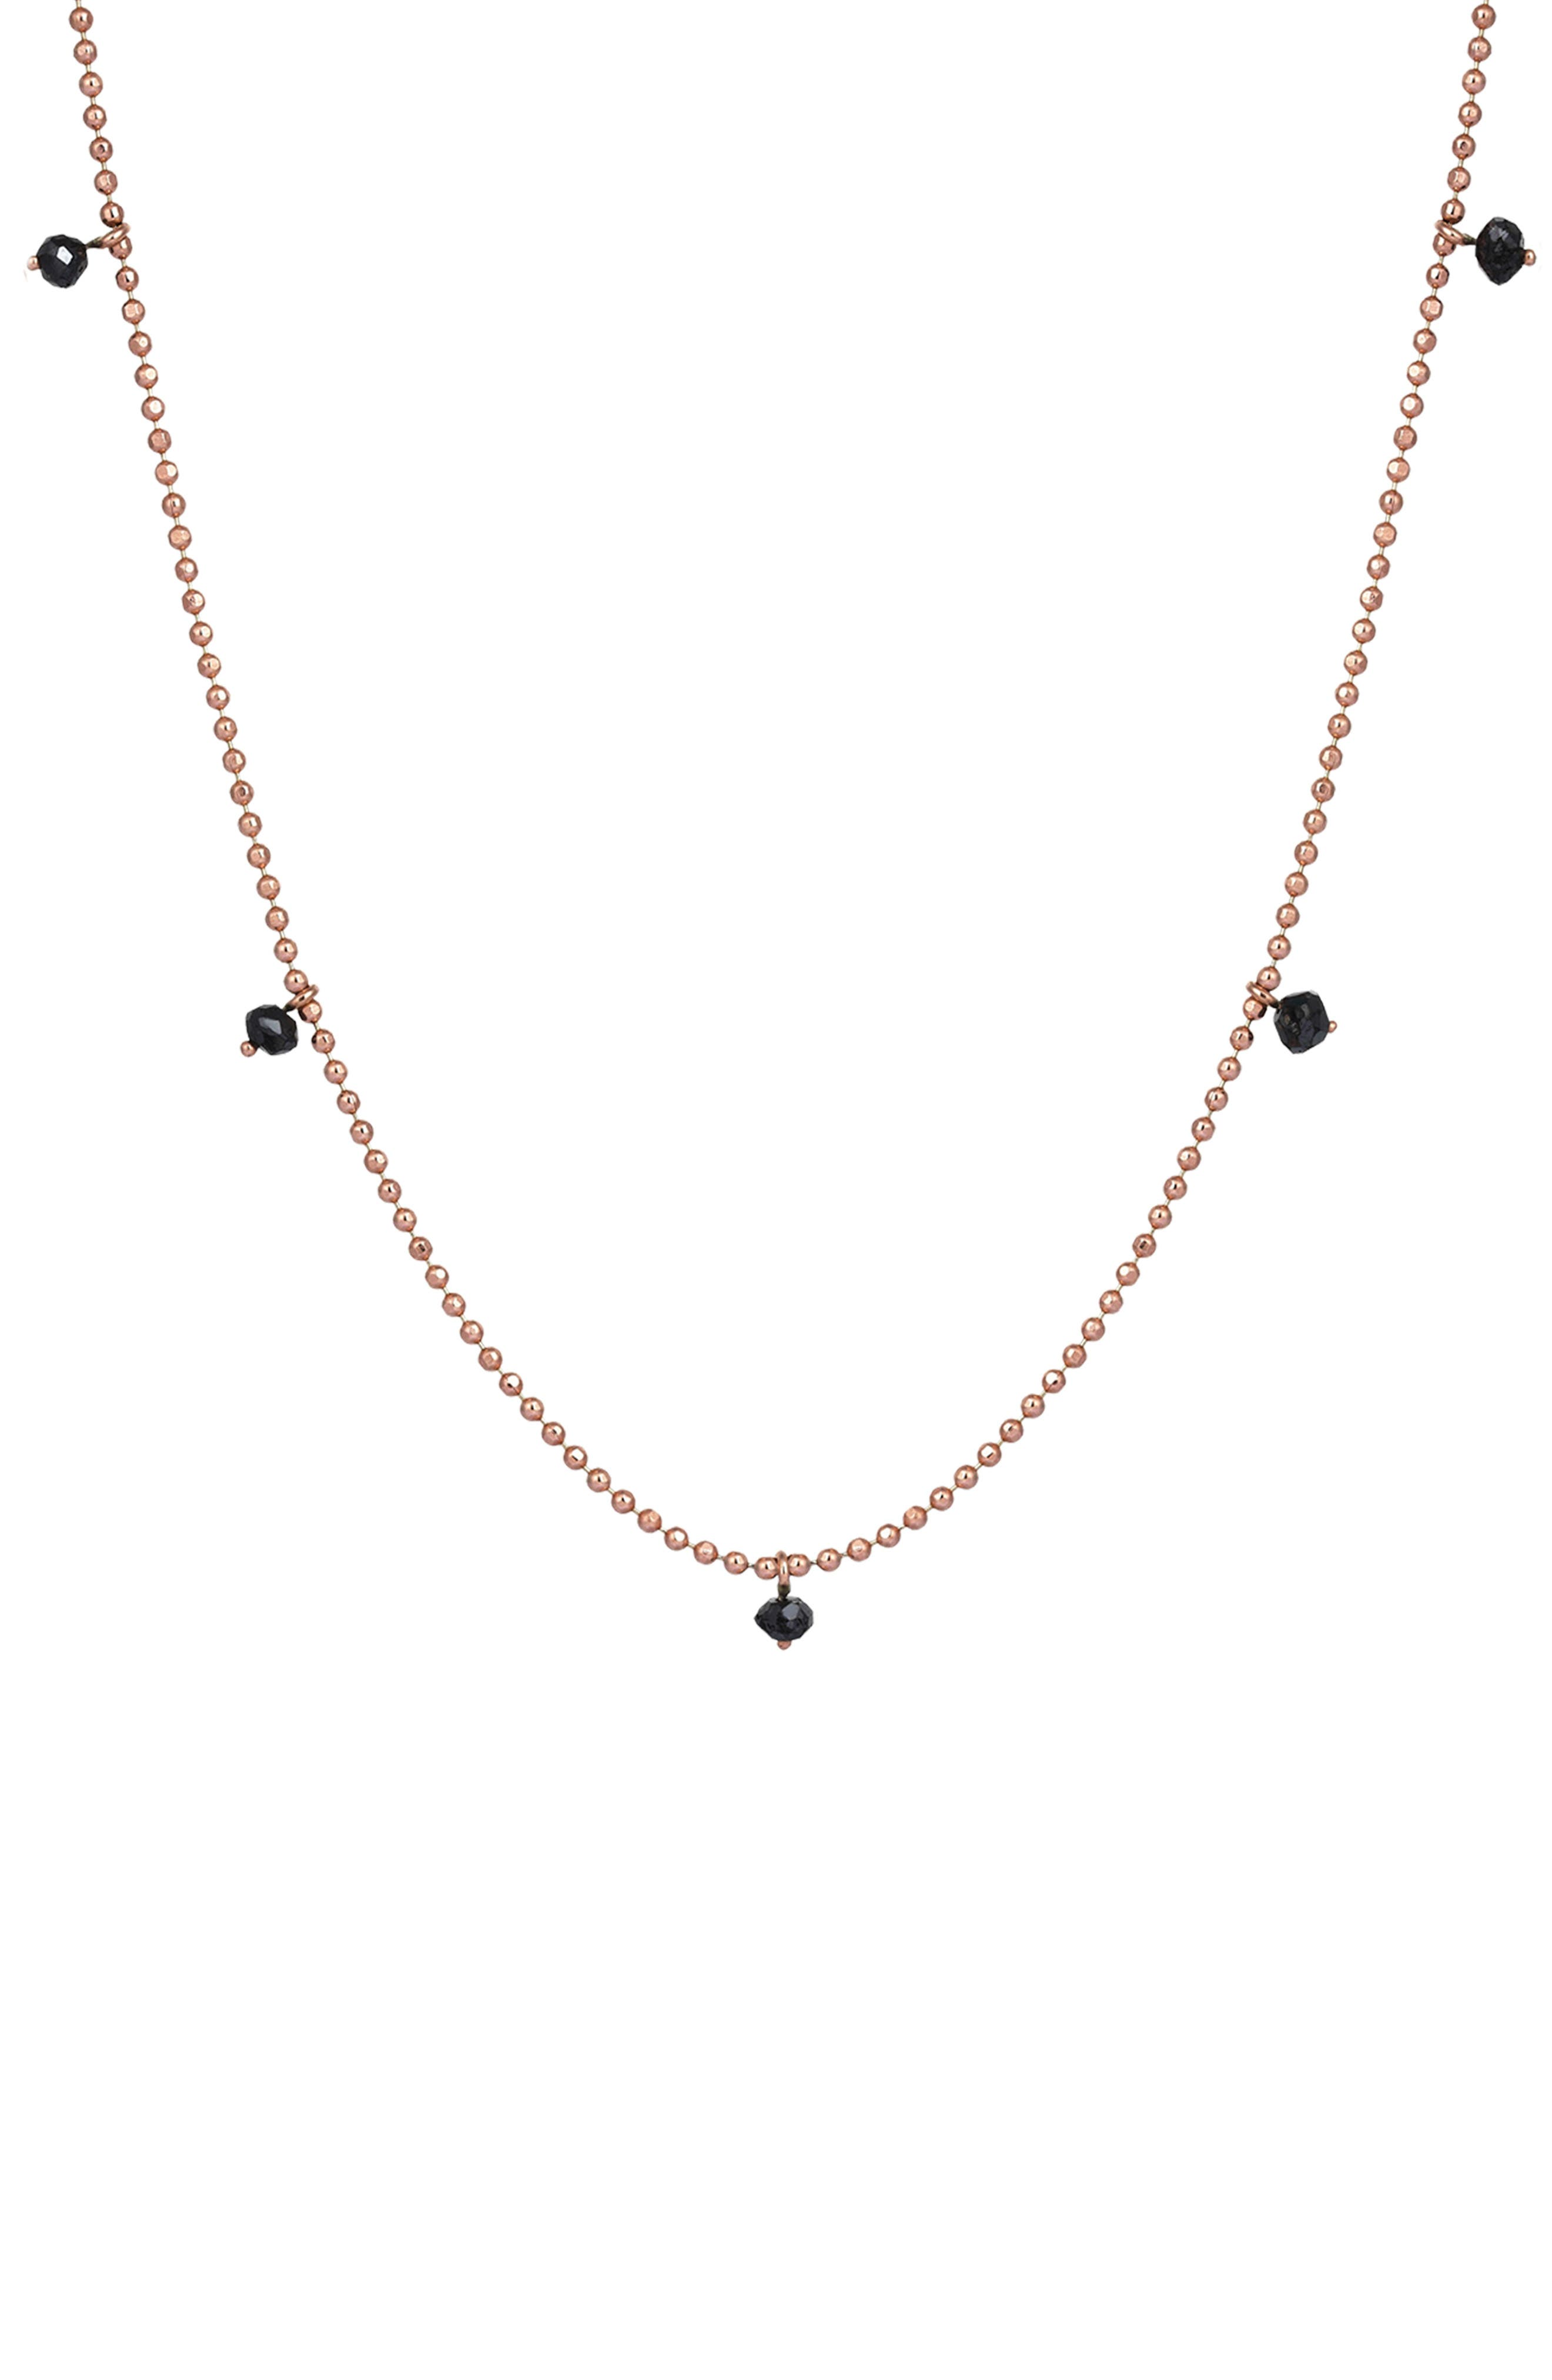 Black Diamond Pendant Necklace,                         Main,                         color, ROSE GOLD